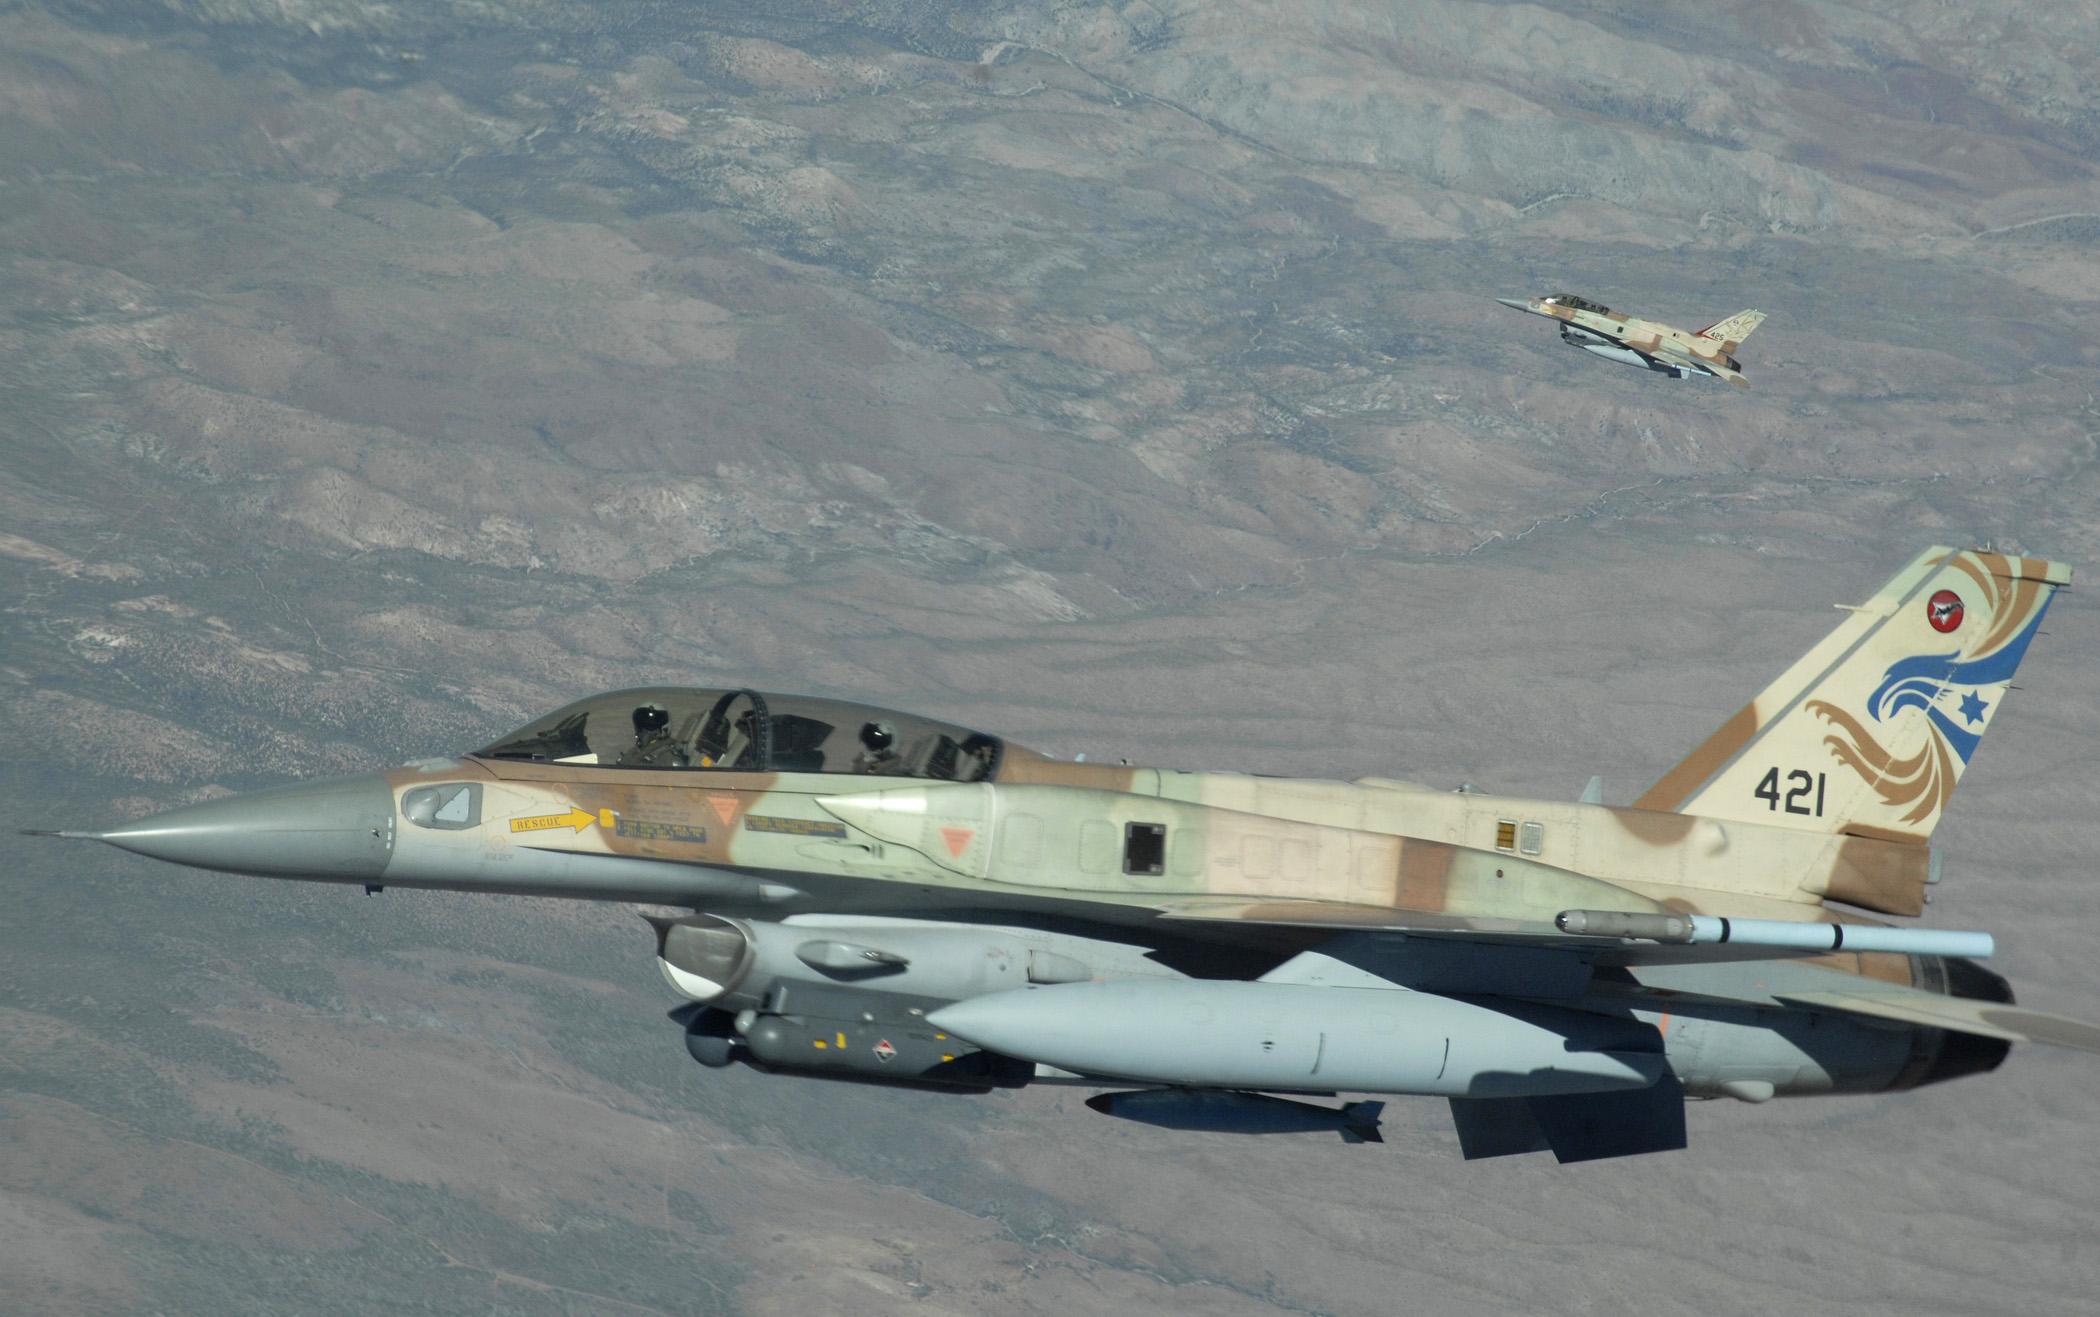 Israeli strike aircraft. USAF photo by Master Sergeant Kevin J. Gruenwald, via Wikimedia.